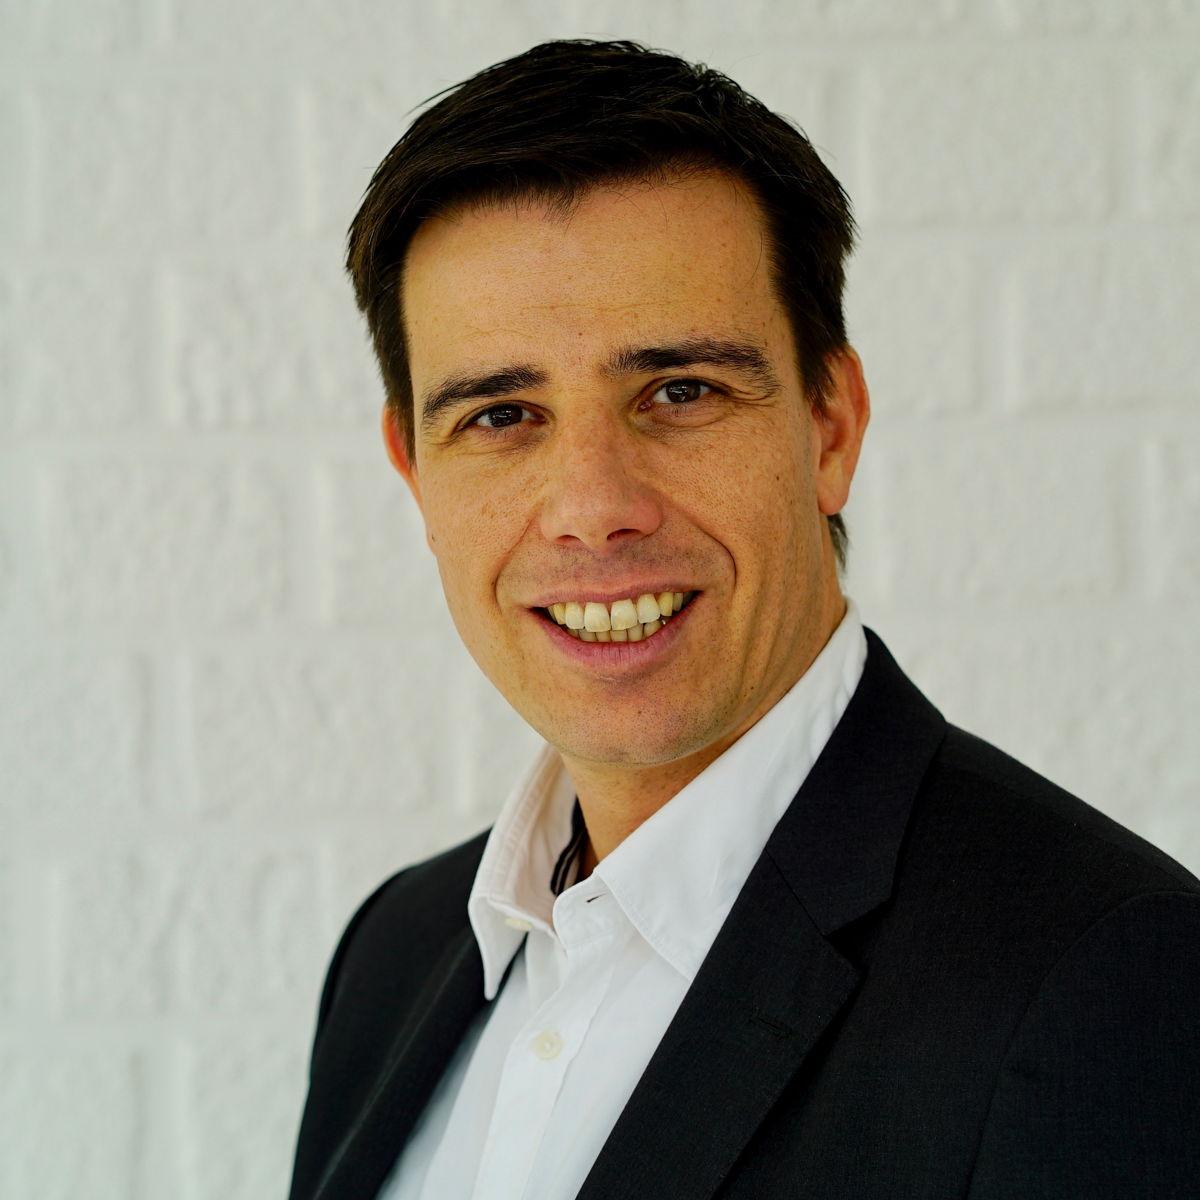 Alex Van Cauwenbergh - CEO CRANIUM-Groep